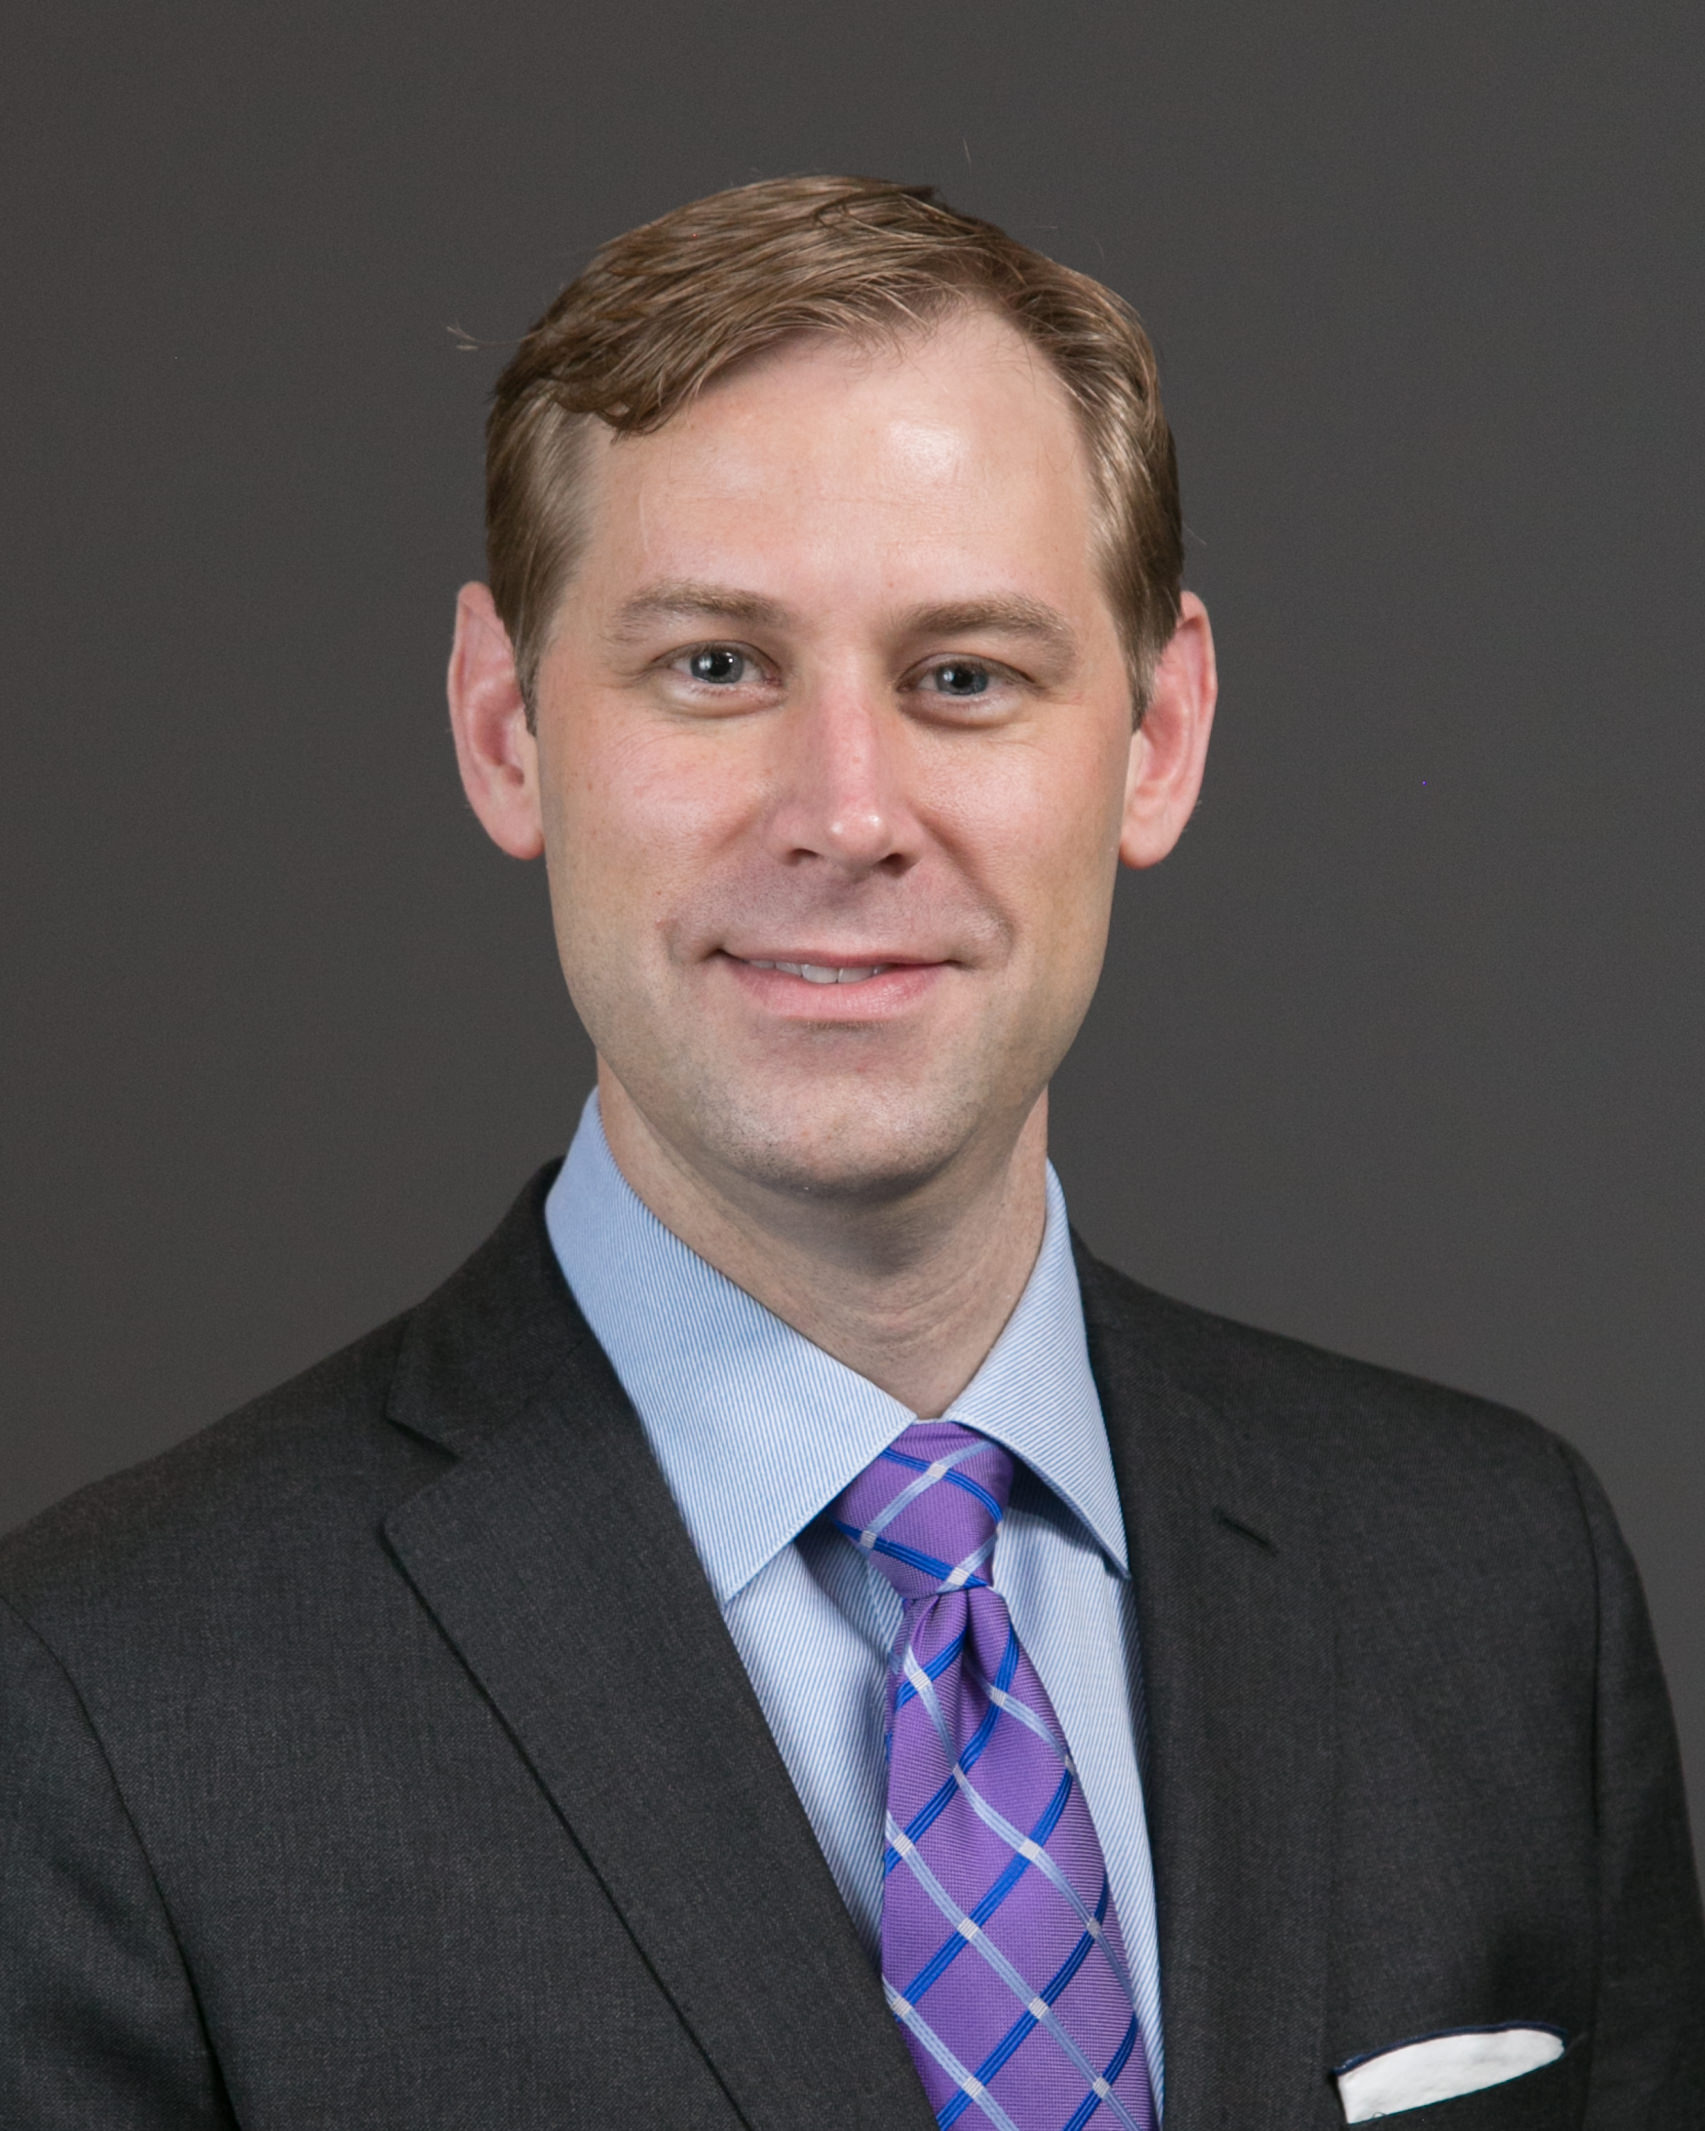 Cory Hansen